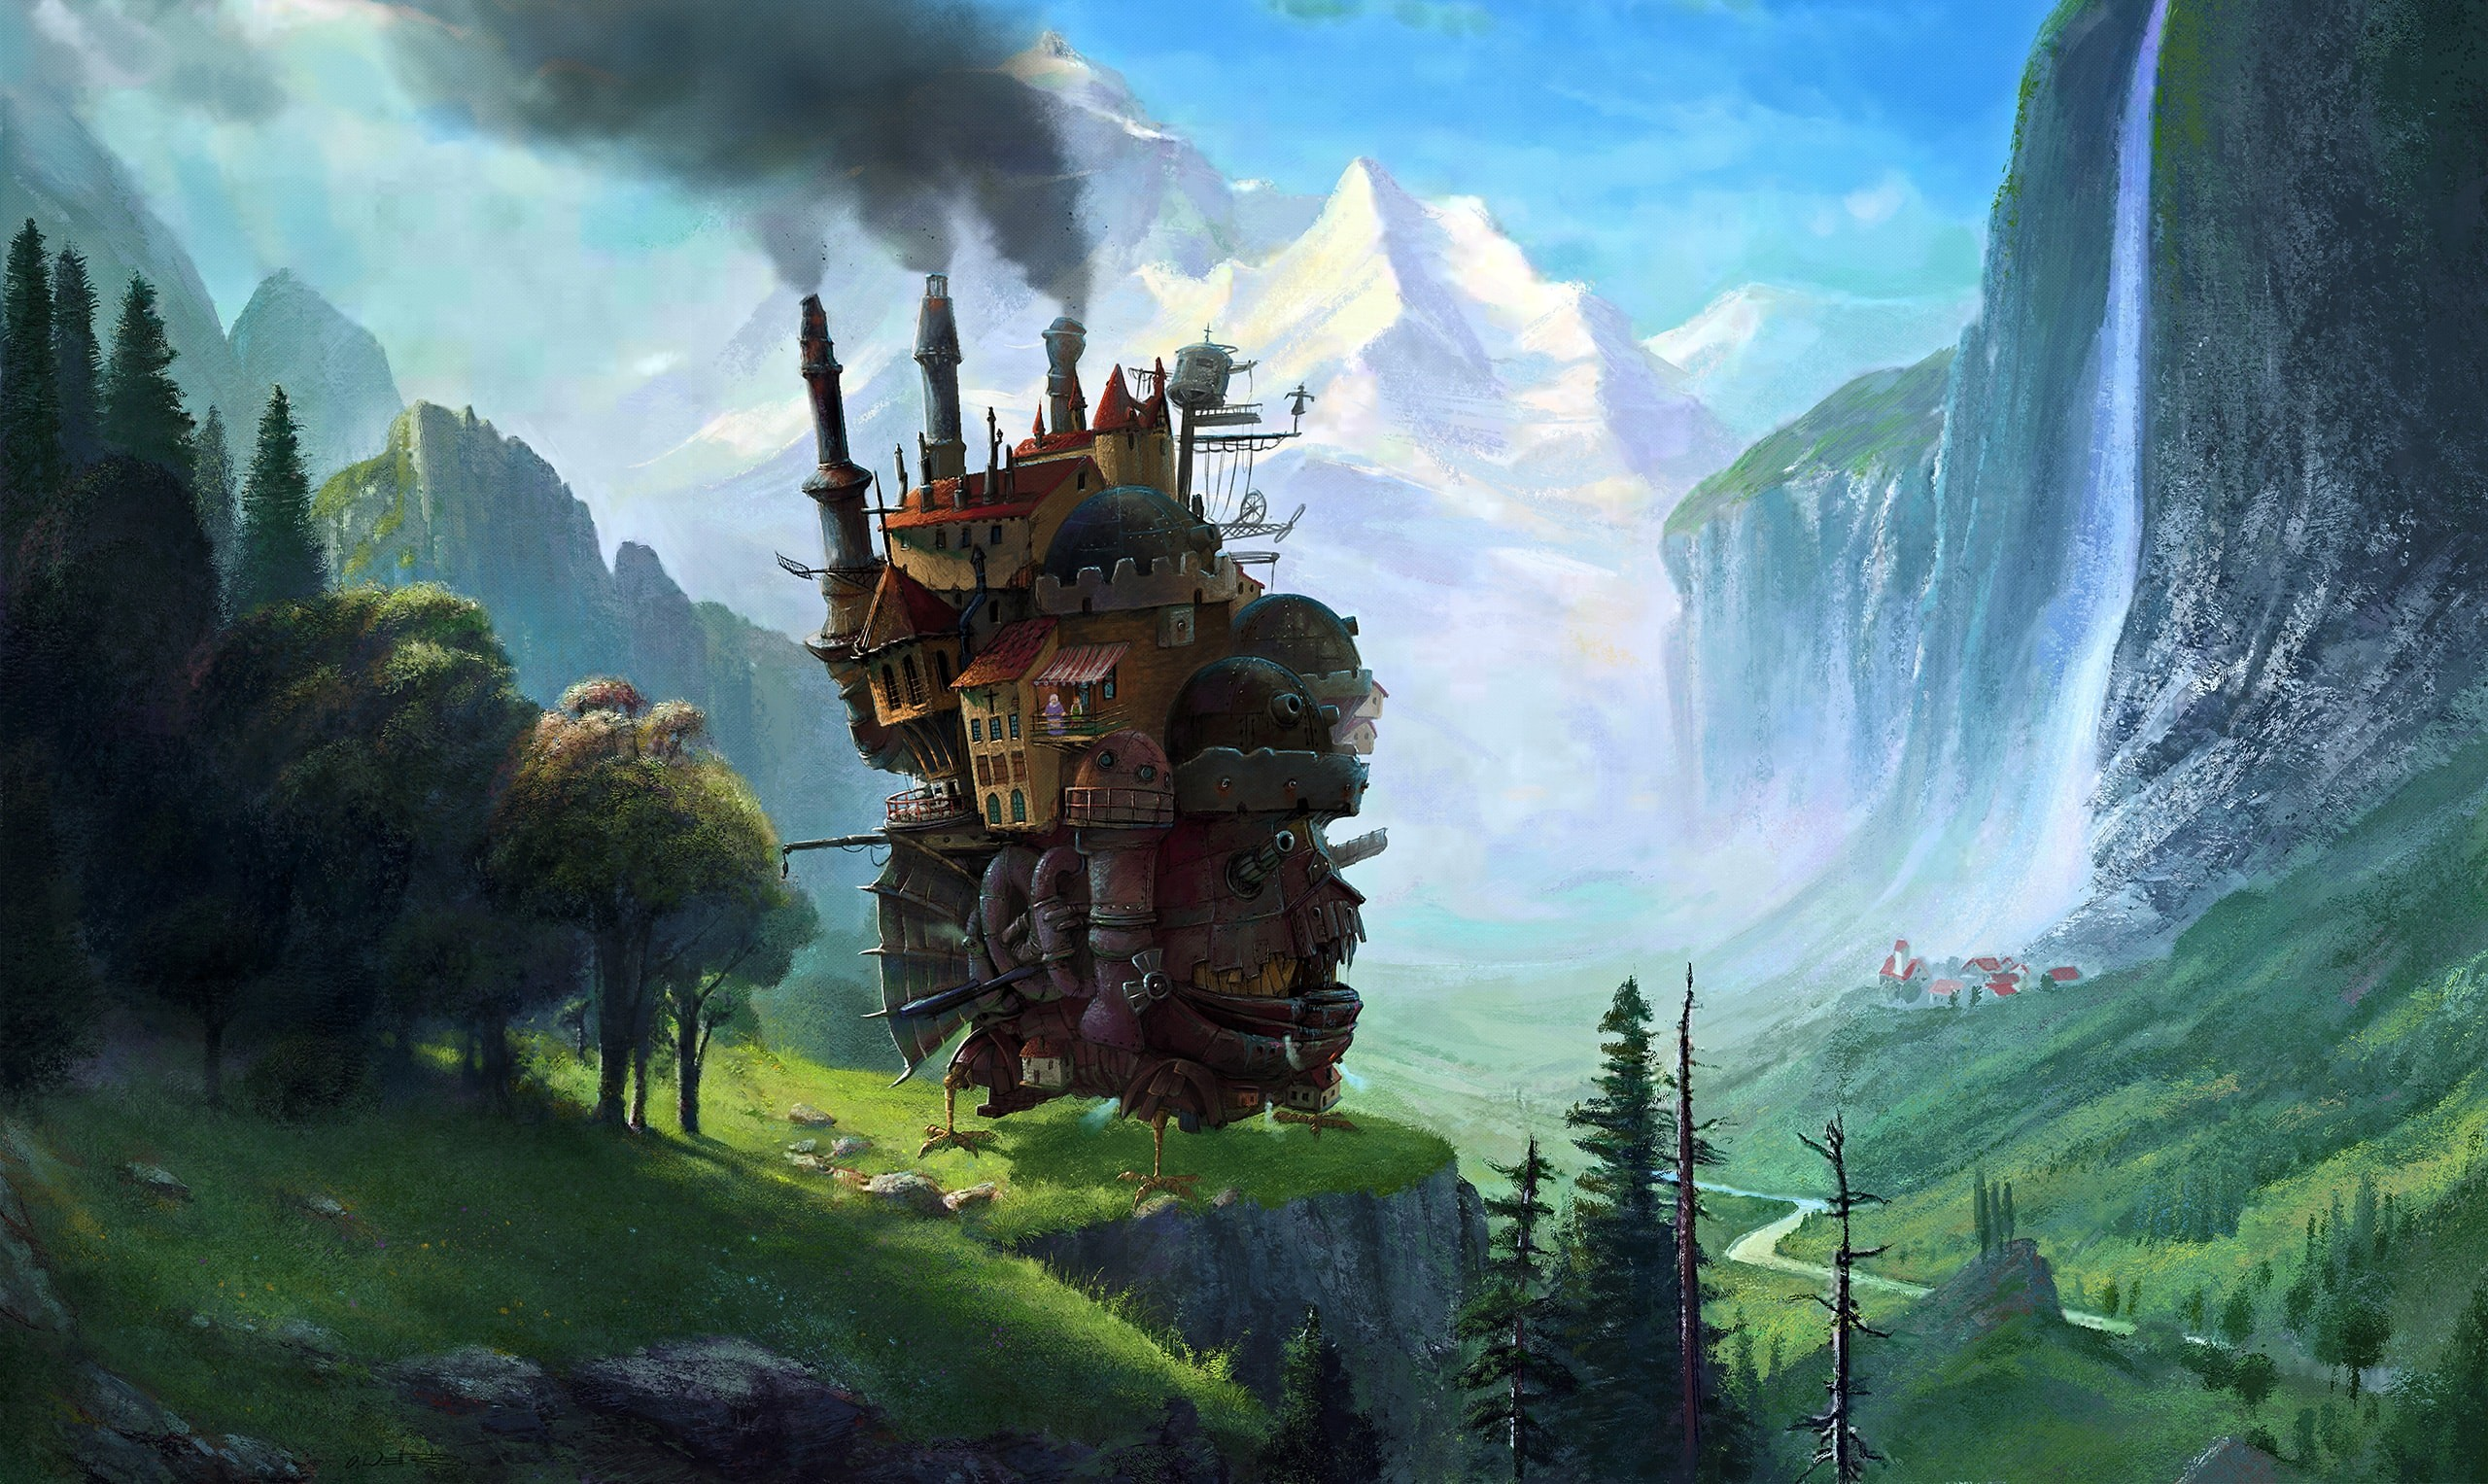 Howl's Moving Castle hd wallpaper